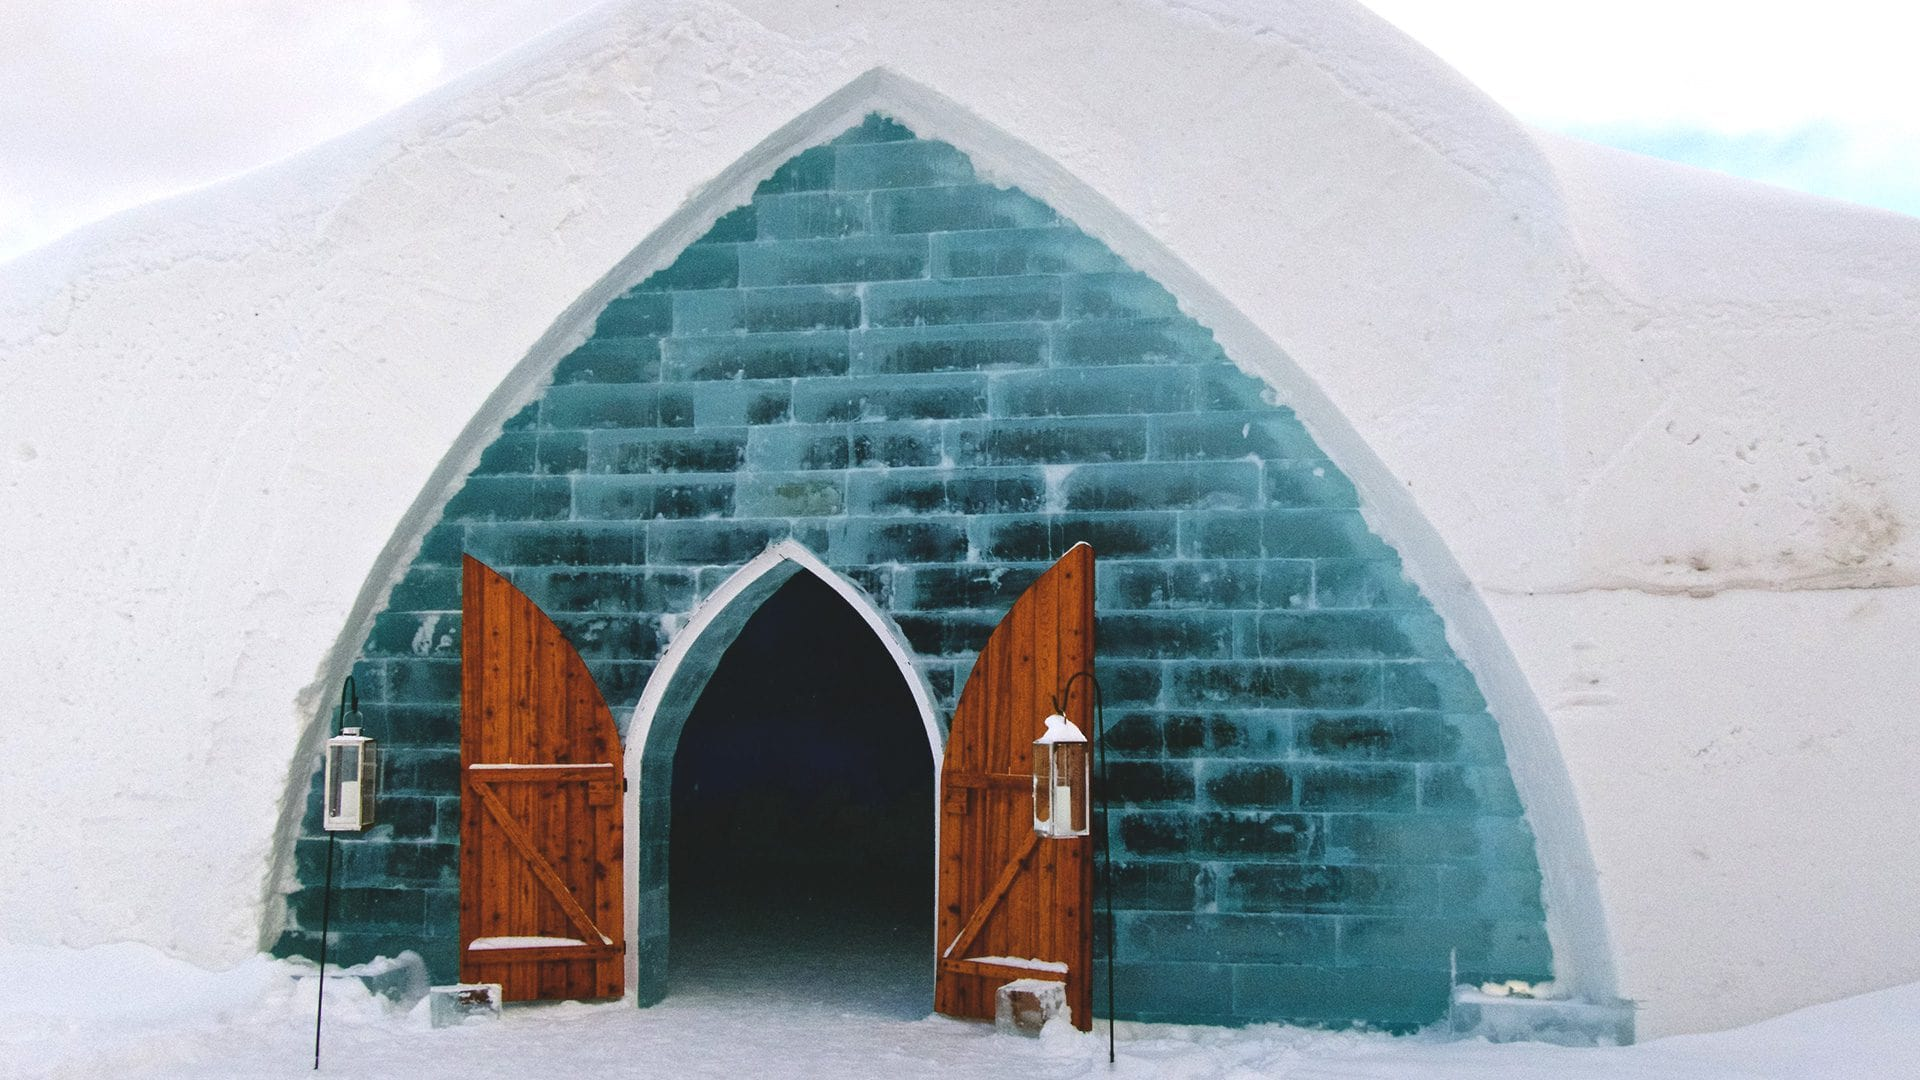 Hoteles de hielo | Rojo Cangrejo Blog de Viajes